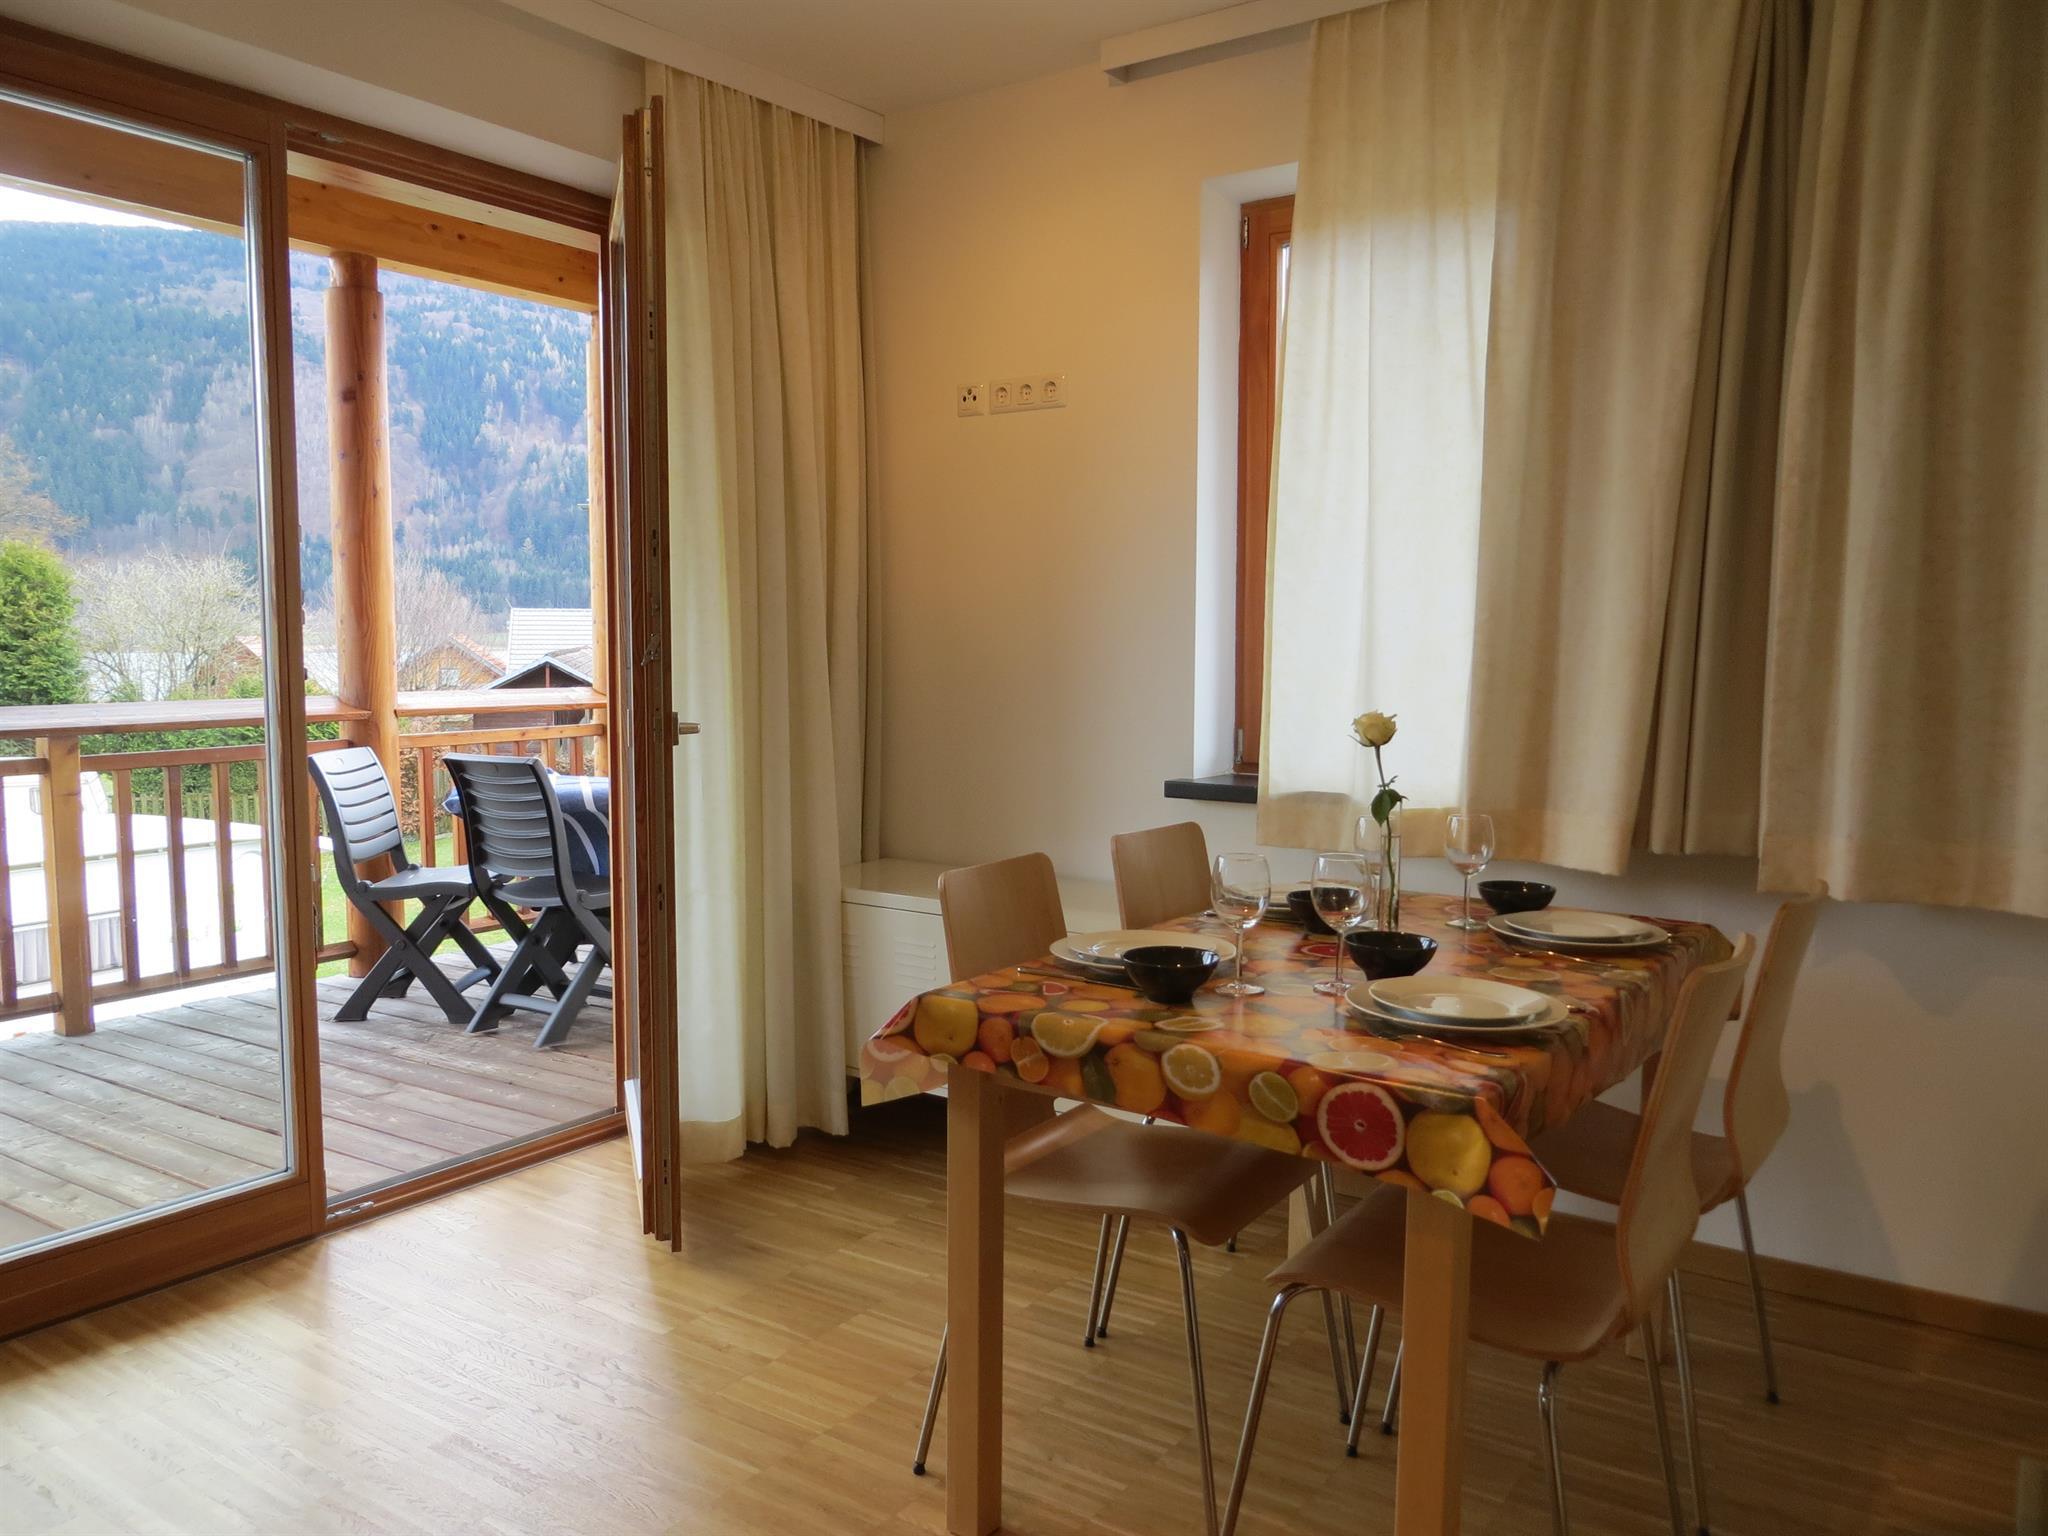 Maison de vacances Seevilla Ossiacher See Seevilla Gerlitze (2526804), Steindorf am Ossiacher See, Lac Ossiach, Carinthie, Autriche, image 32